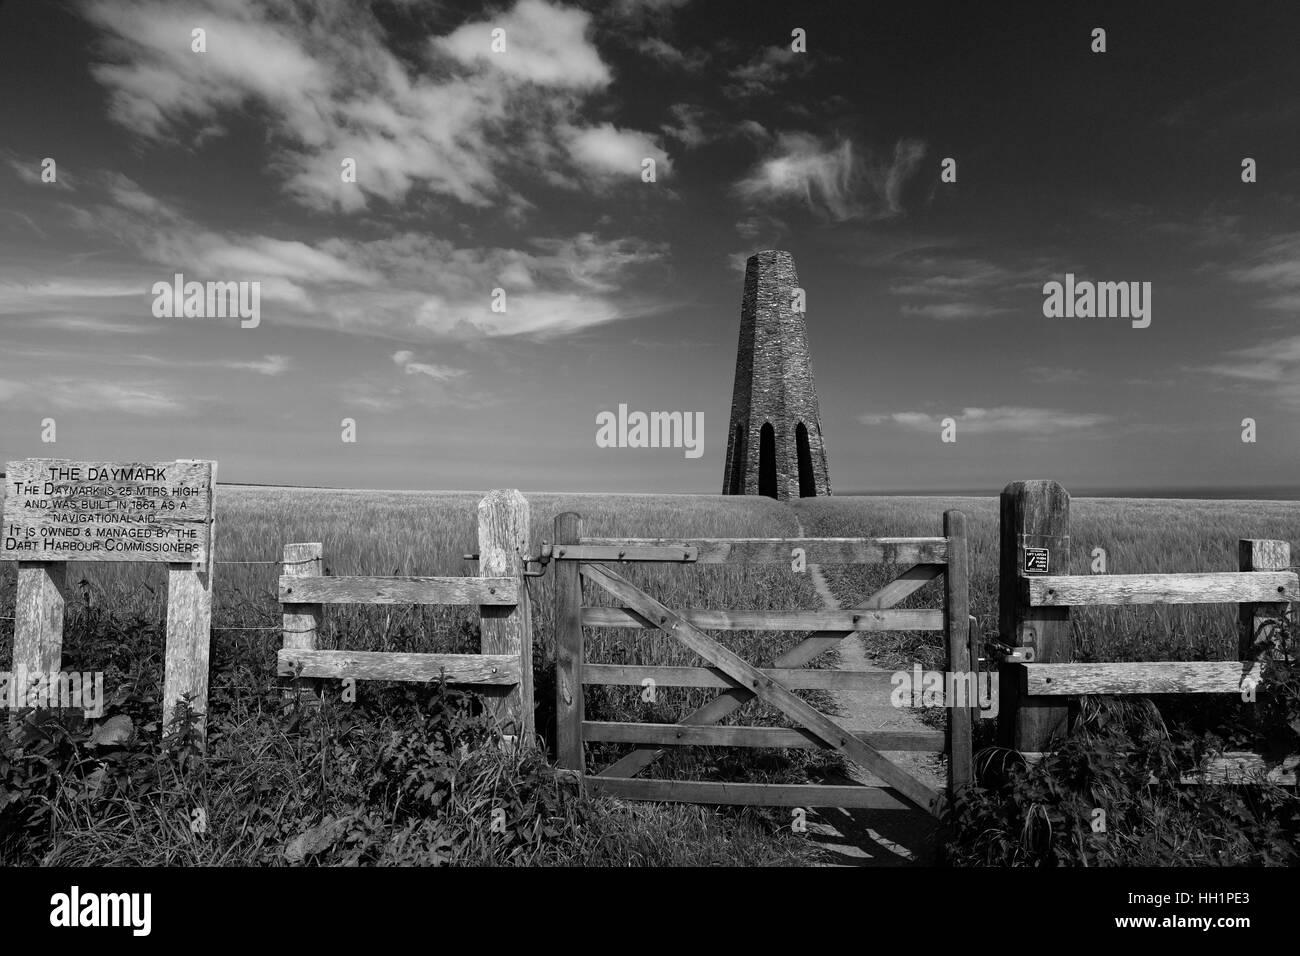 Summer, the stone built Daymark Tower, at Forward Point, Start Bay, near Dartmouth, Devon County, England, UK - Stock Image